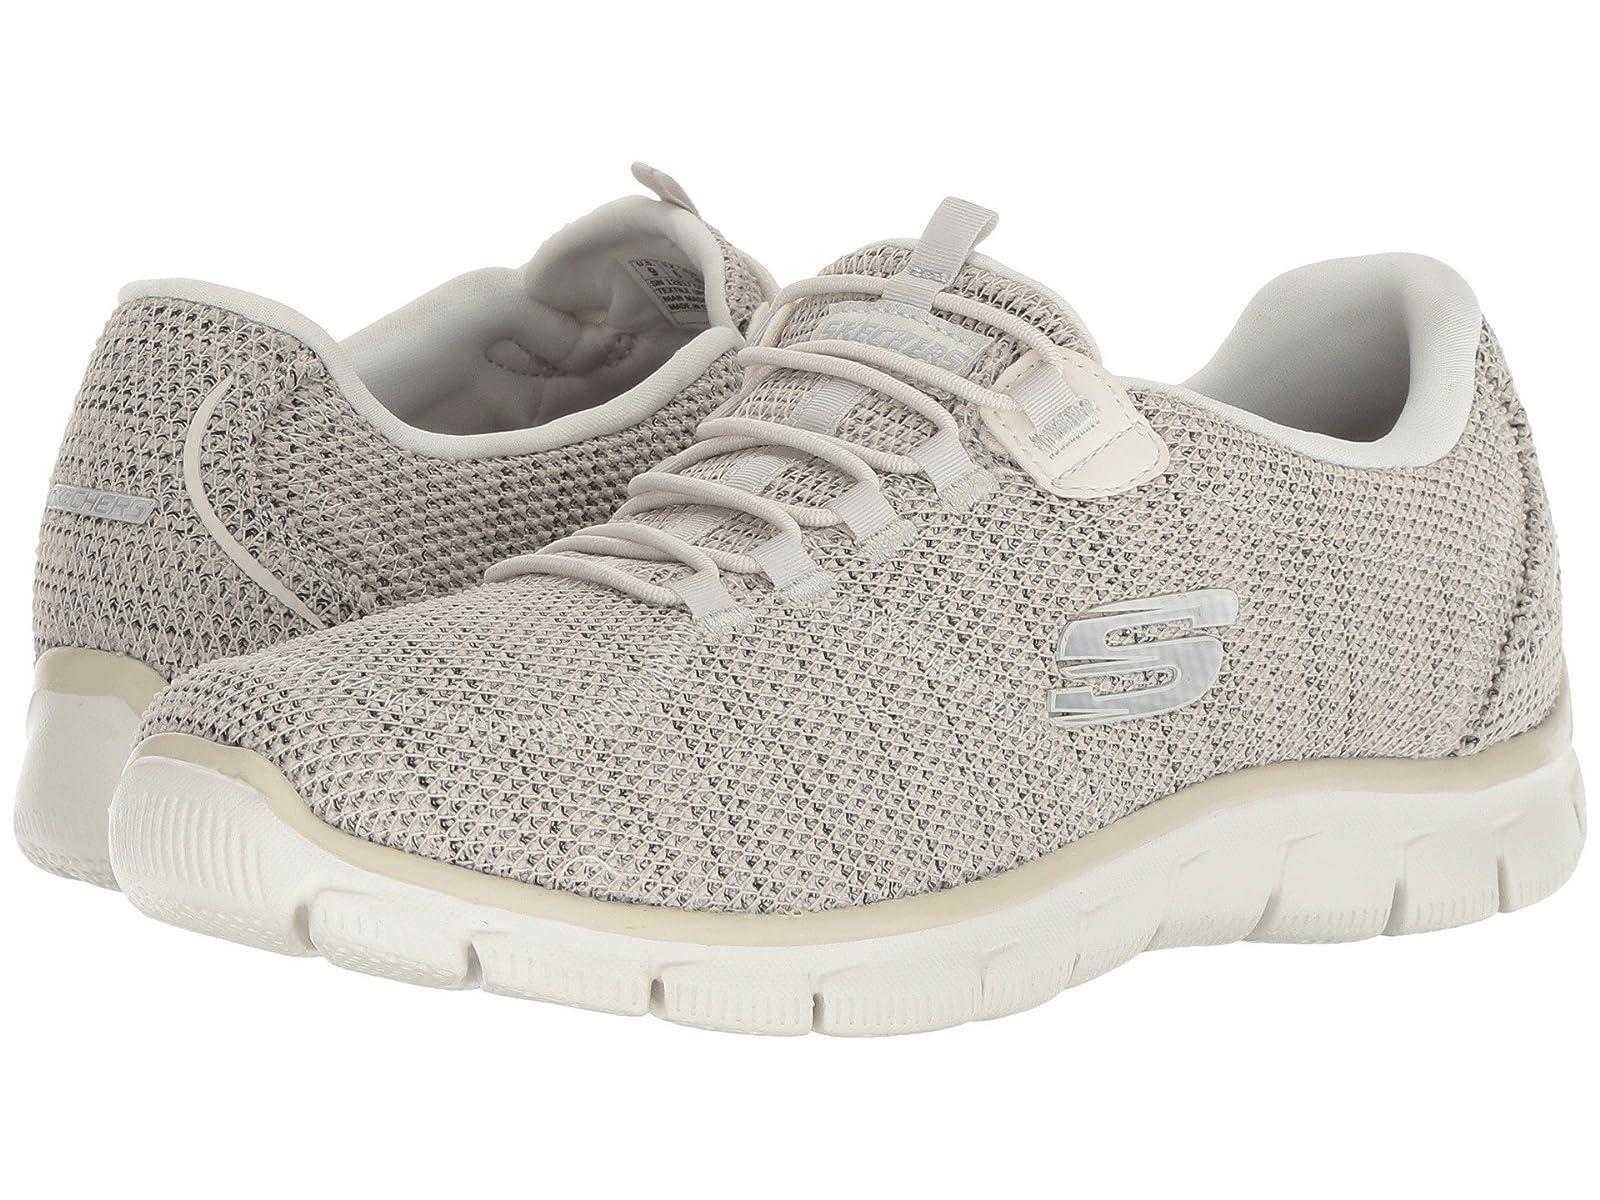 SKECHERS EmpireAtmospheric grades have affordable shoes